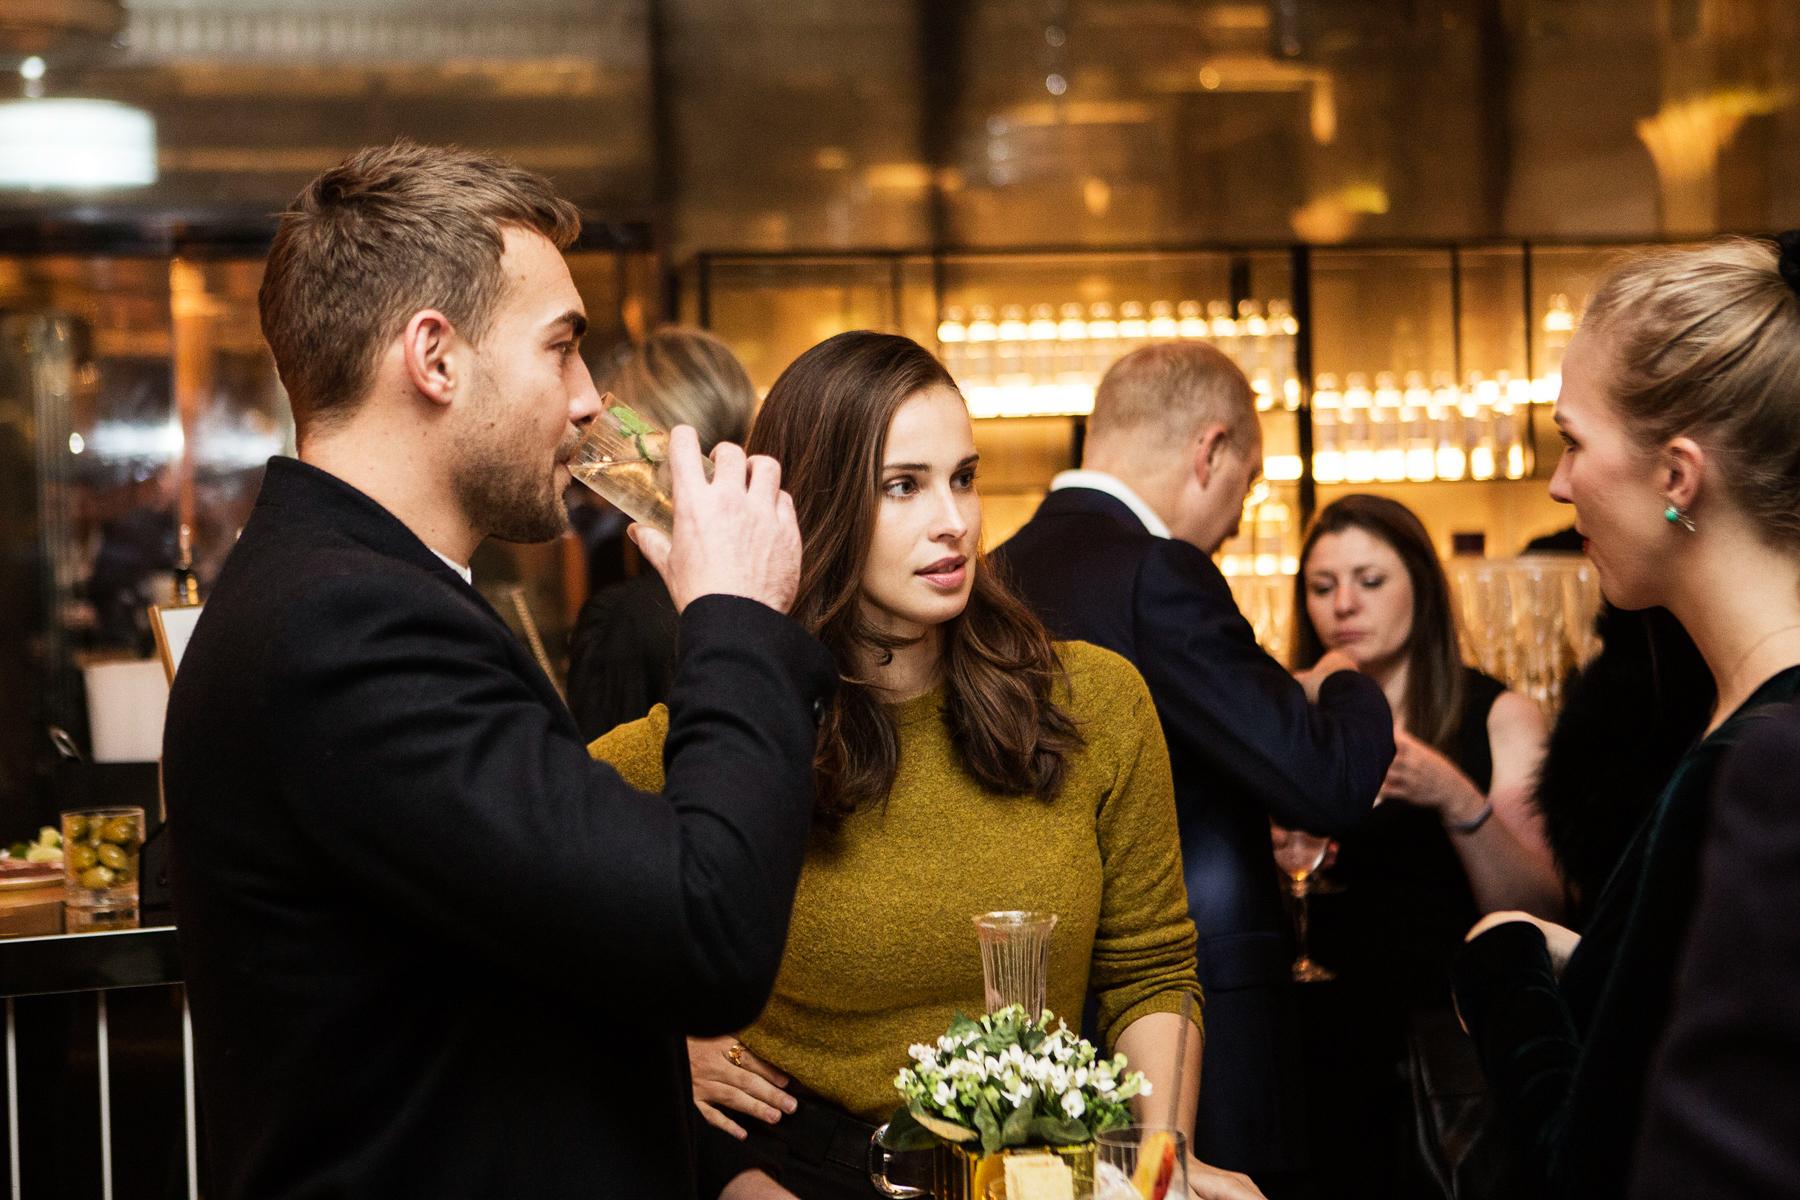 Raccoon London - Corporate Event Photographer - Andreas - May 2018  45.jpg